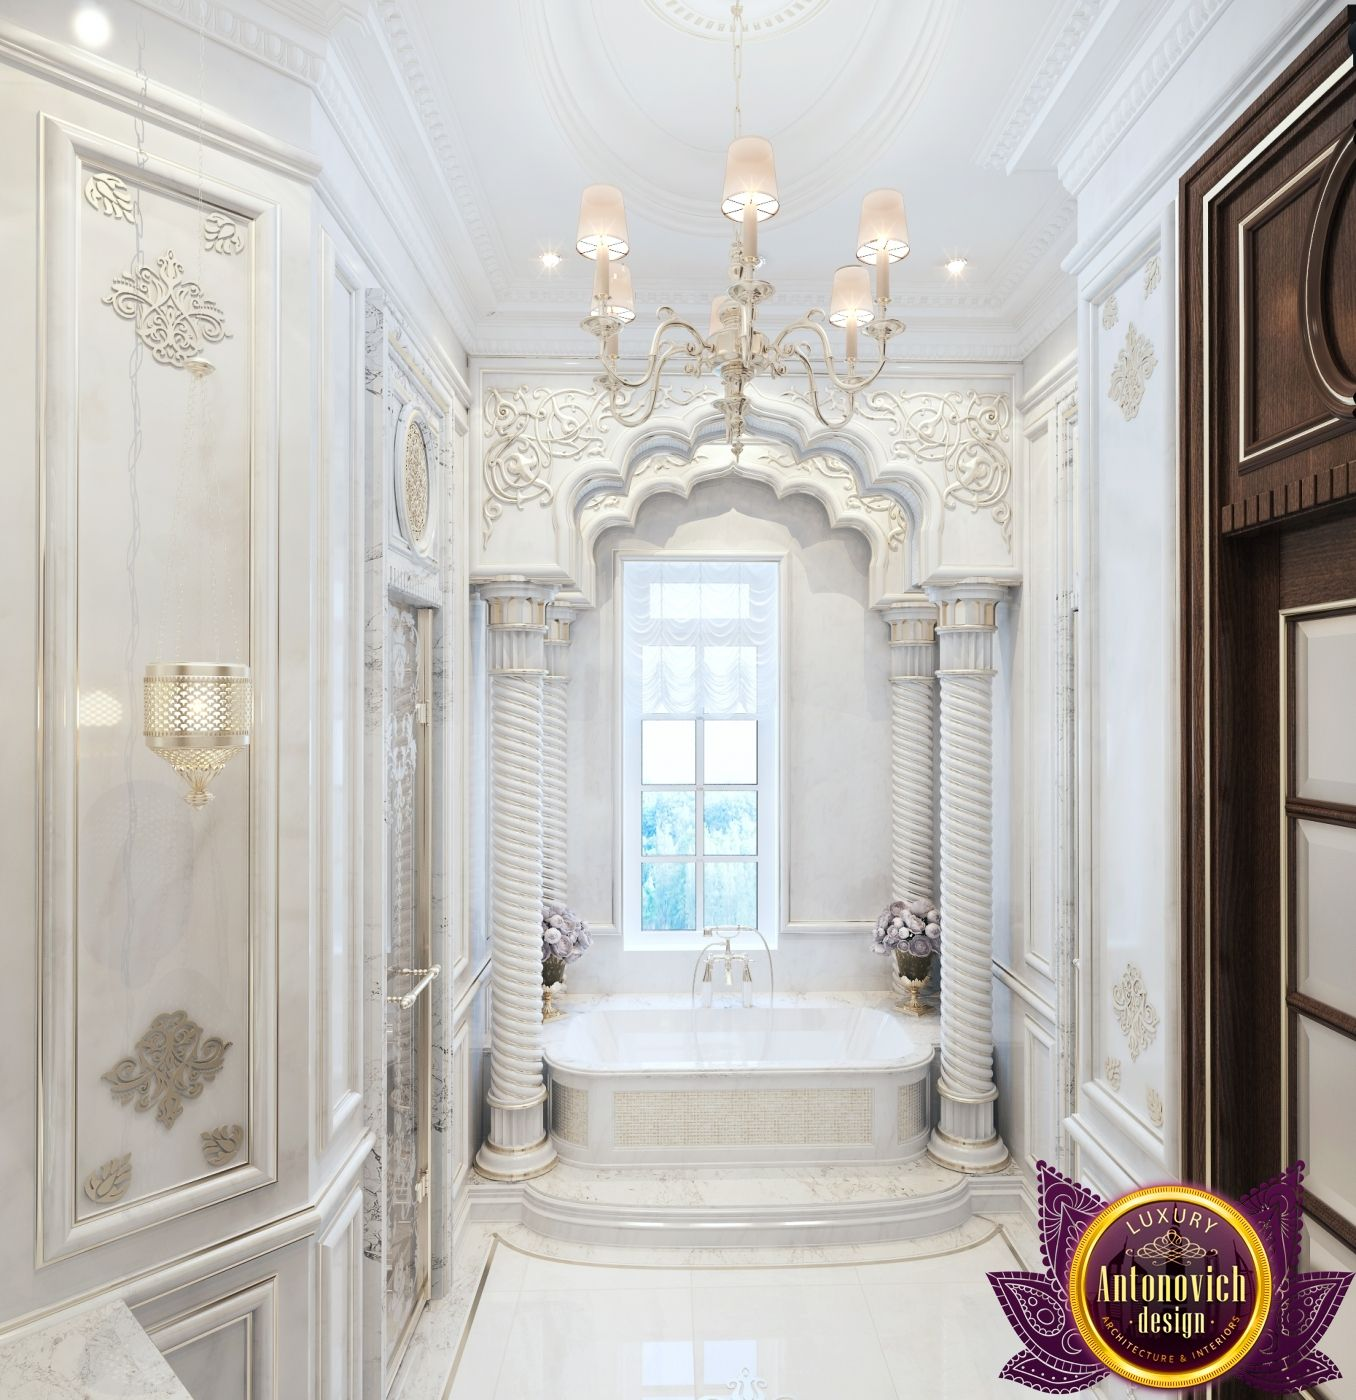 Bathroom Design In Dubai Luxury Bathroom Design Photo 2  Luxury Custom Bathroom Design Company Decorating Design